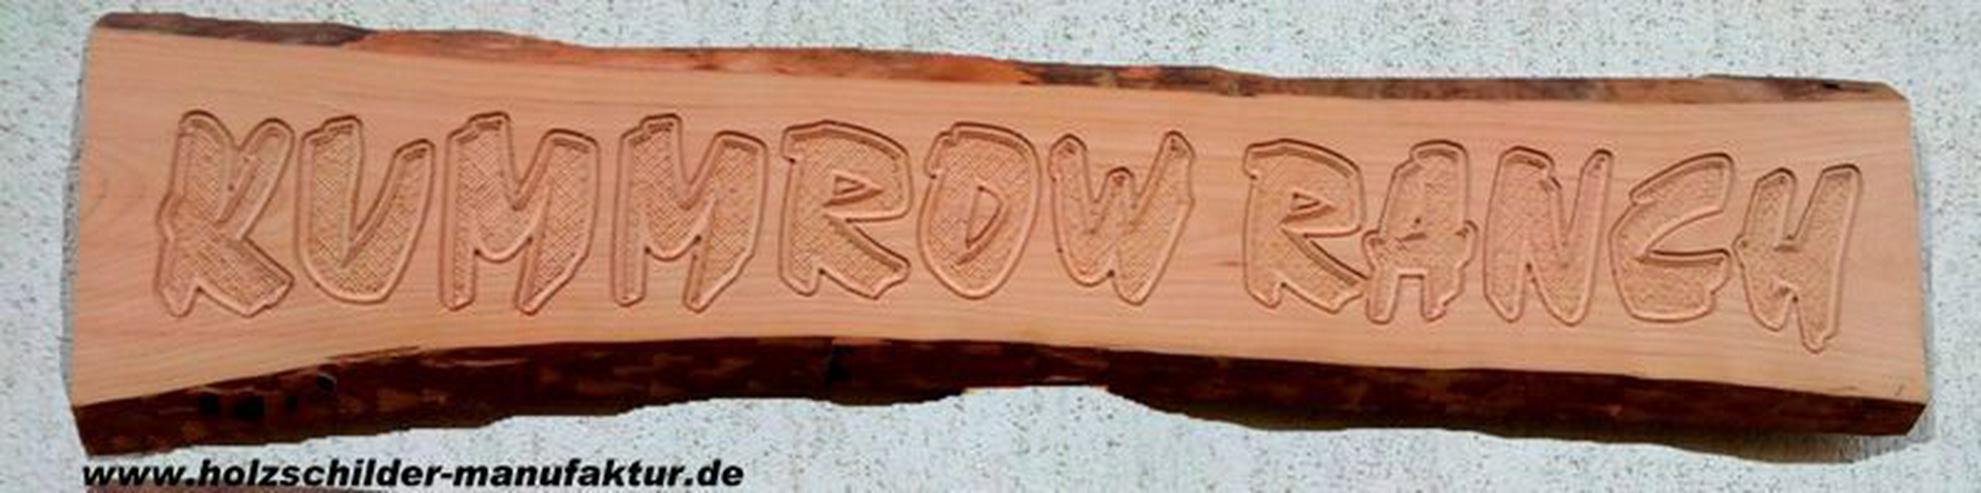 Bild 2: rustikale Holzschilder